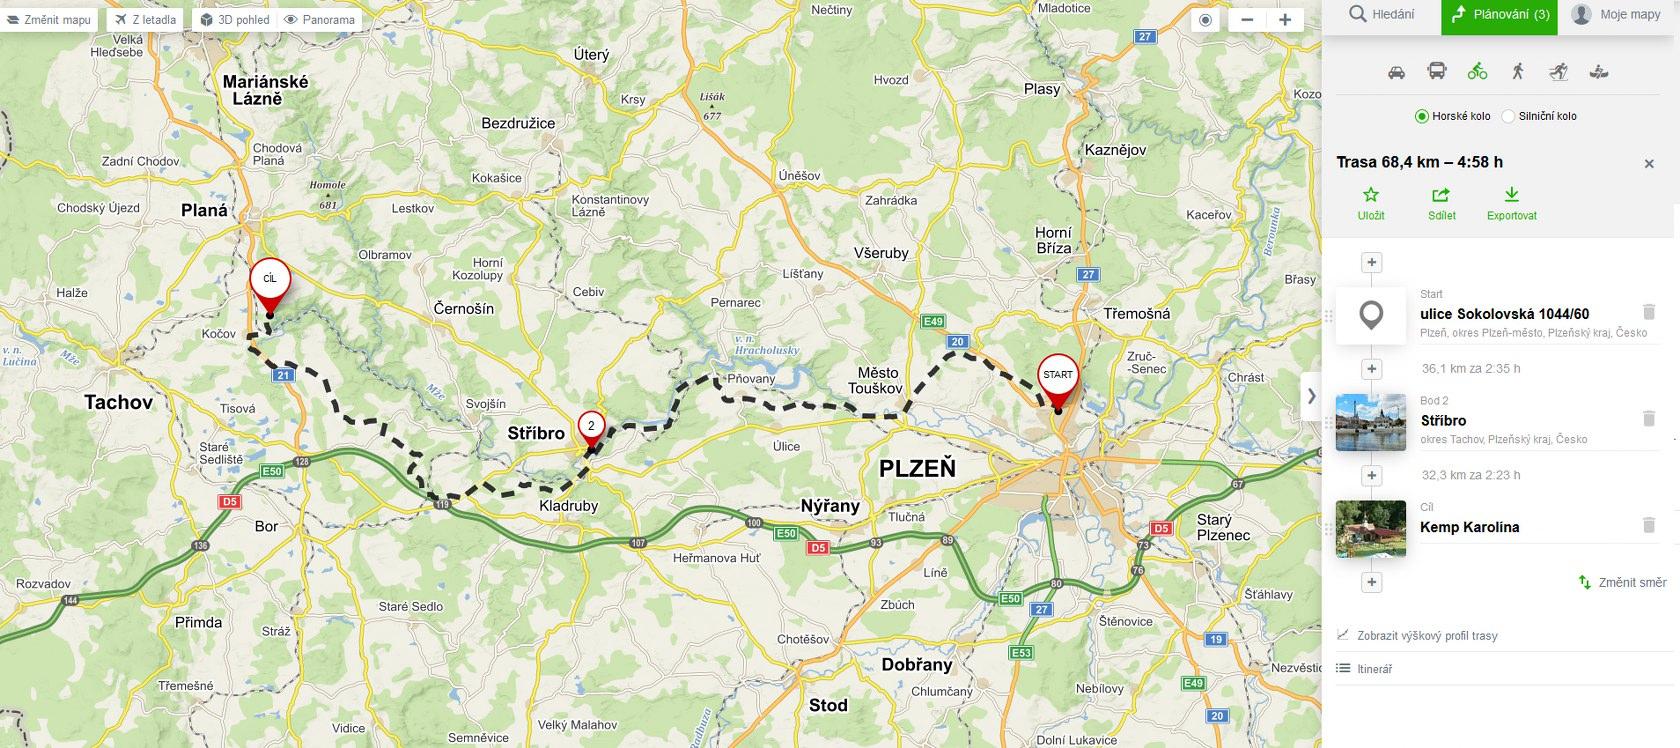 https://www.kempy-chaty.cz/sites/default/files/turistika/trasa_plzen_kemp_karolina_1680x748.png